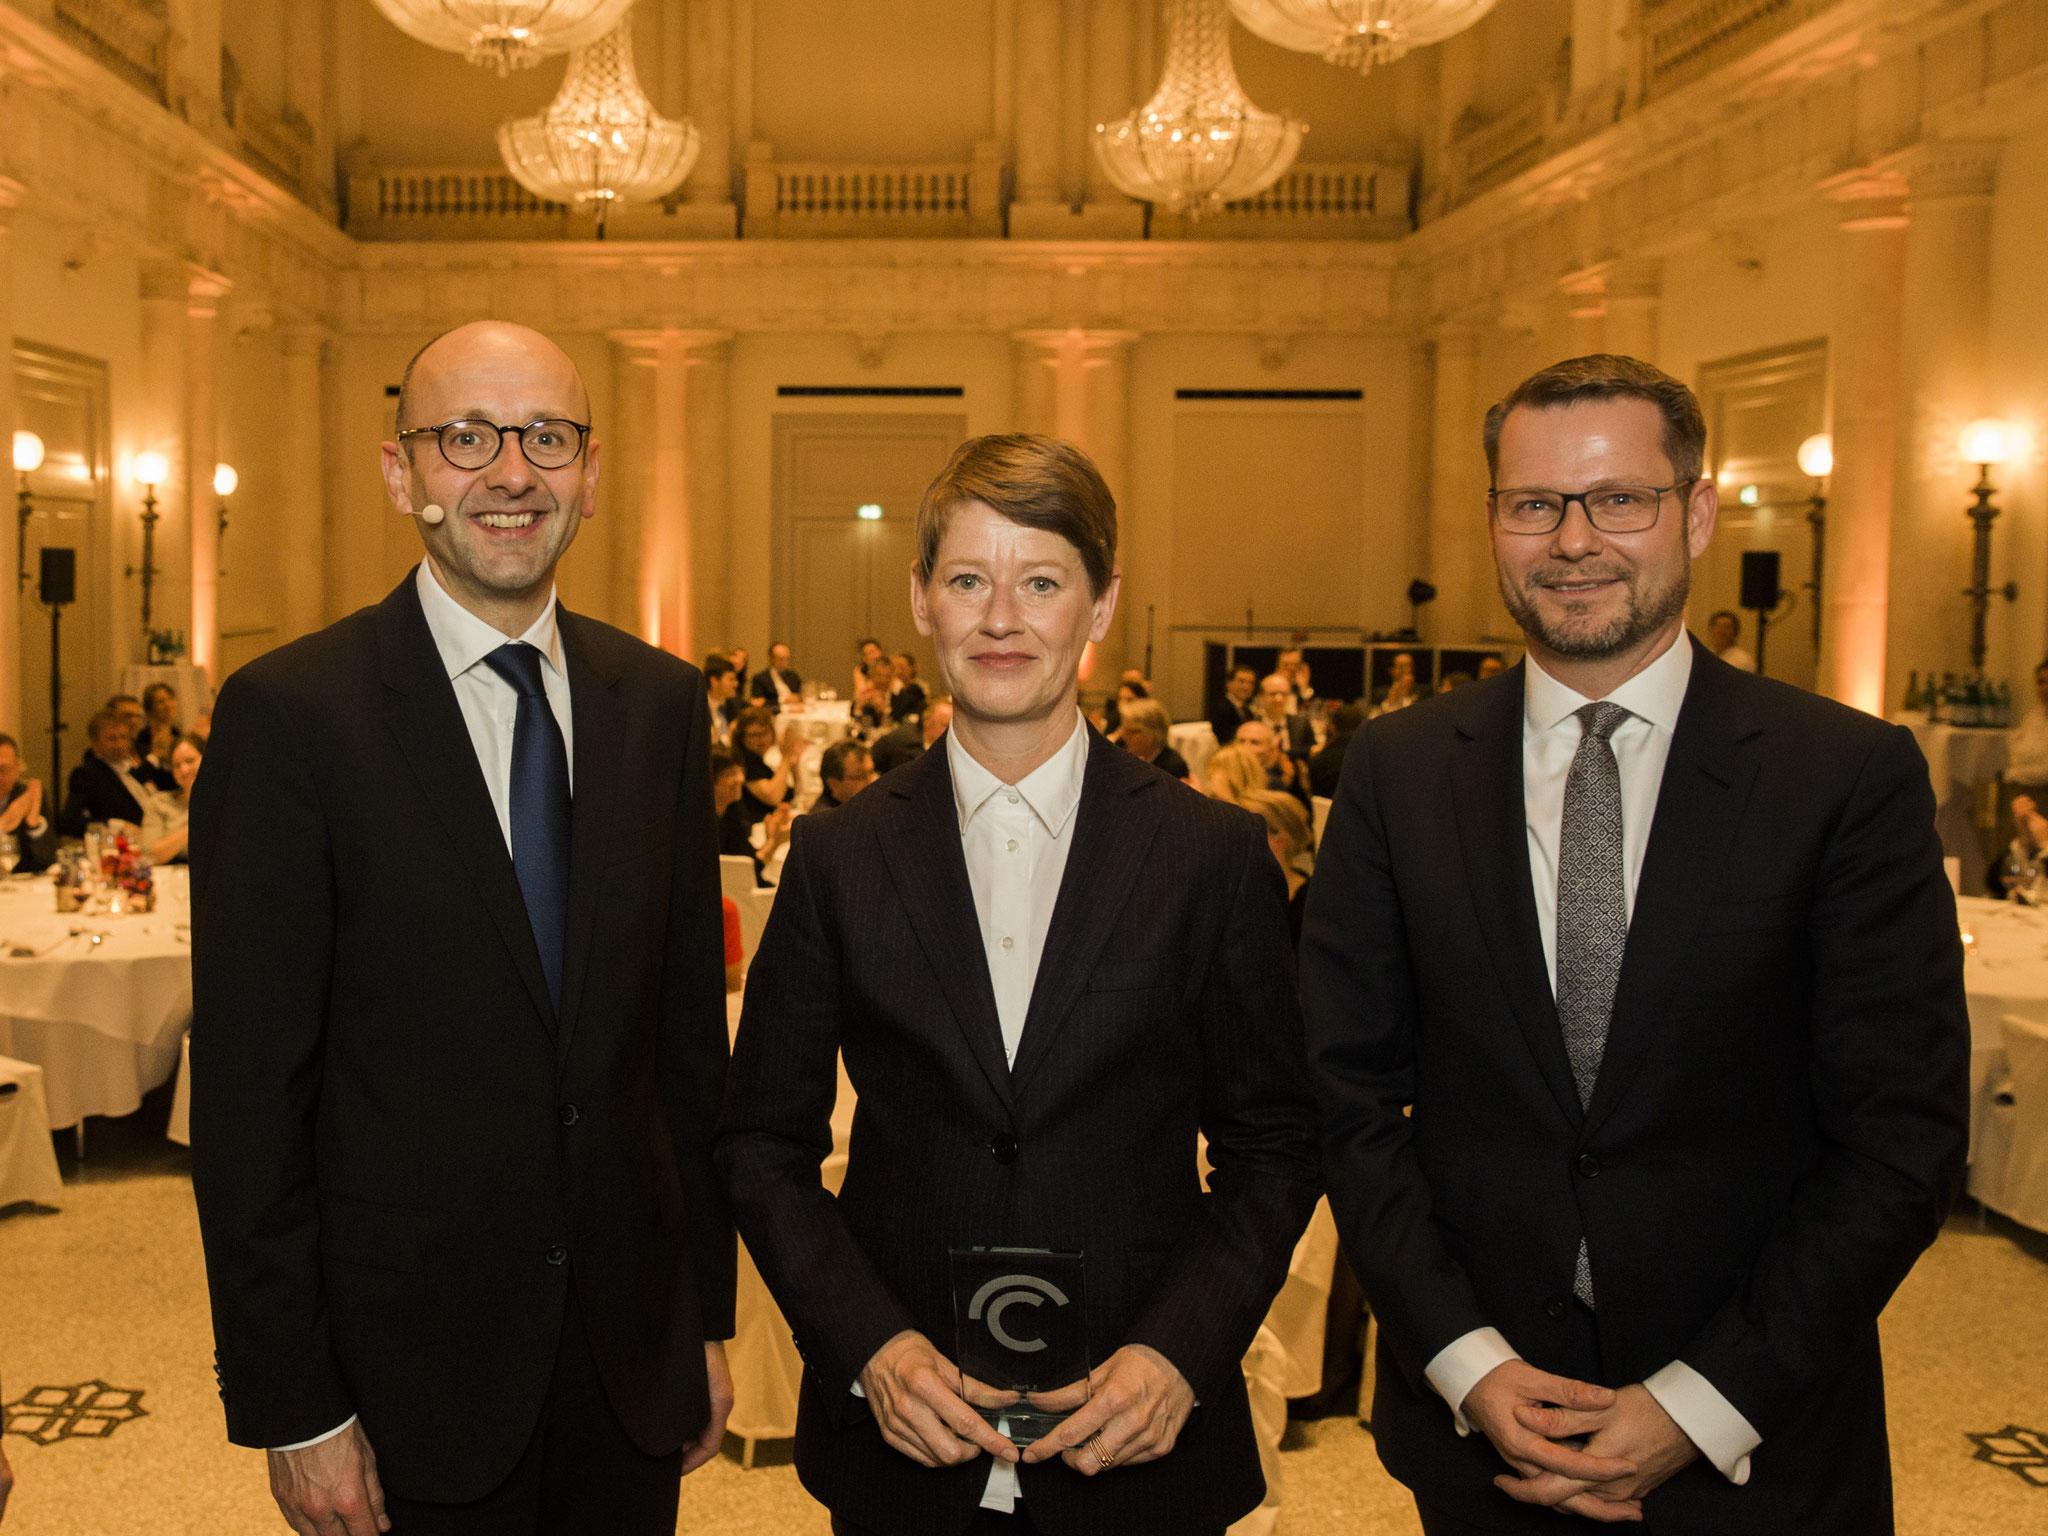 Lucas Flöther, Catherine Hoffmann, third prize Journalism Award, Dirk Andres © 2018 Sven Döring